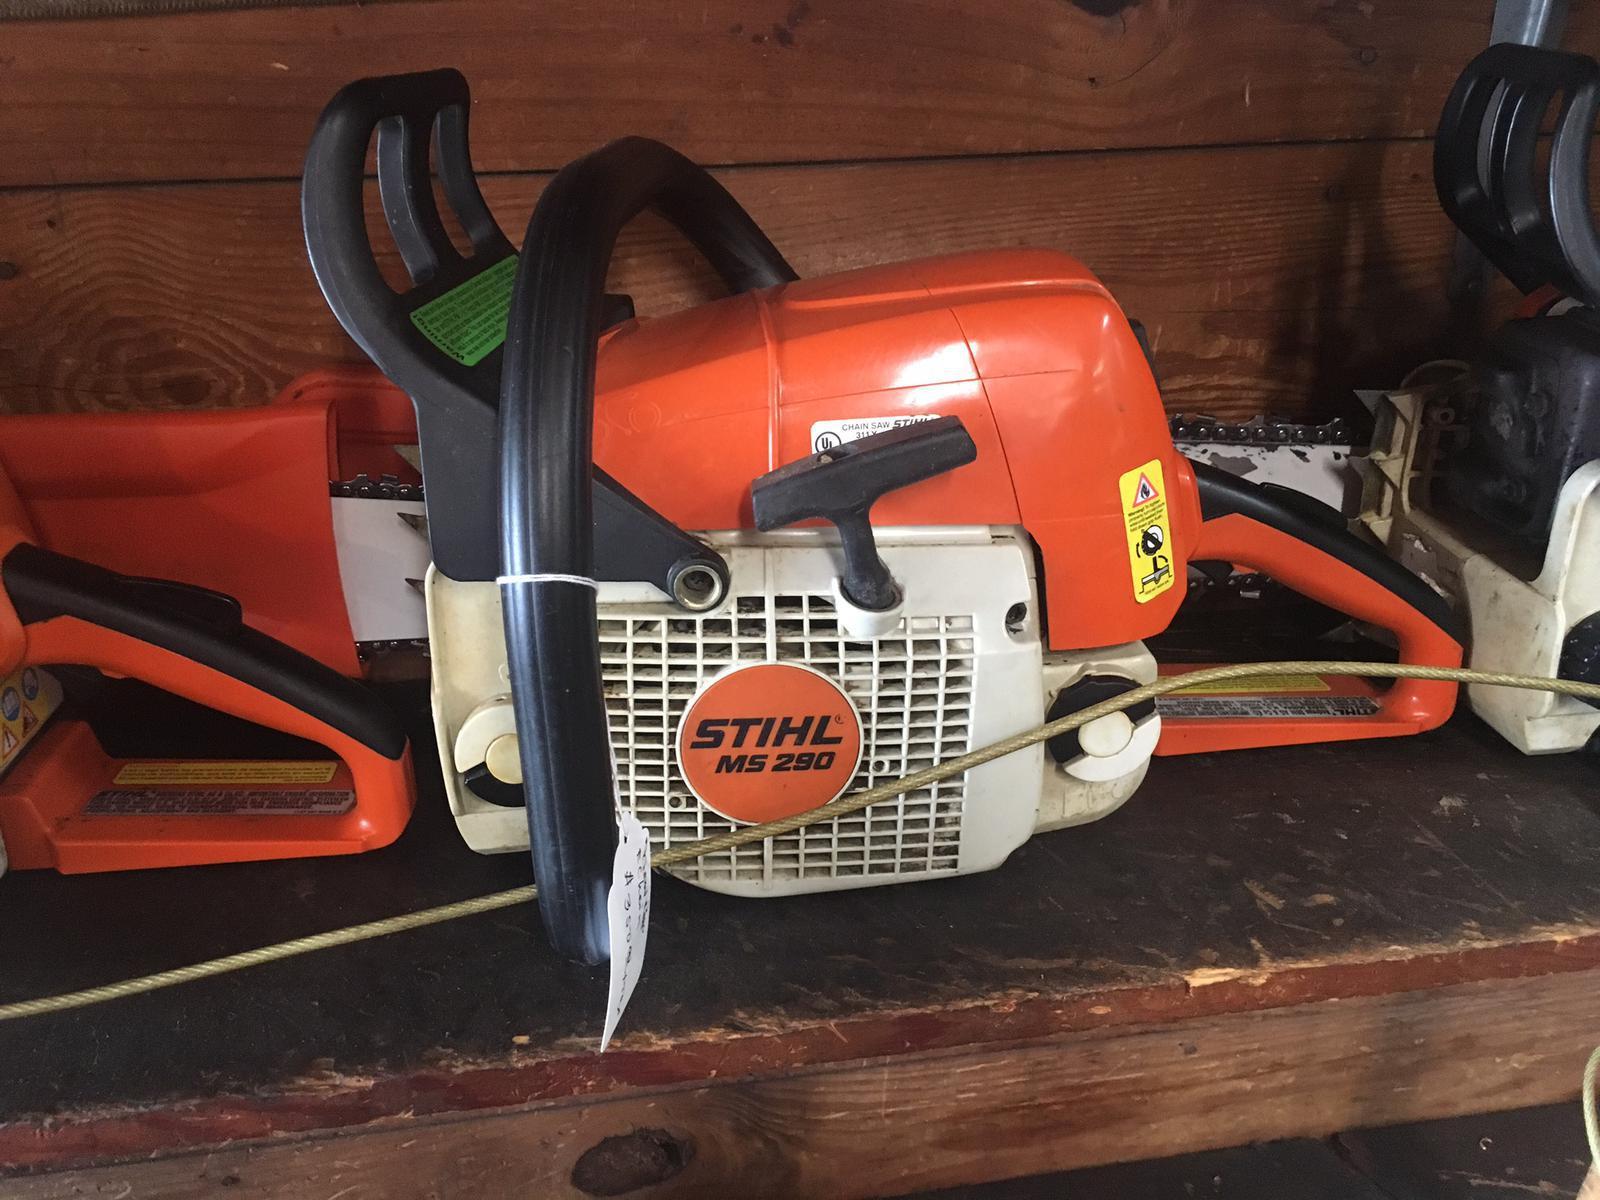 2010 stihl ms 290 farm boss chain saw for sale in lynn in polley farm service inc 765 874 2291 [ 1600 x 1200 Pixel ]